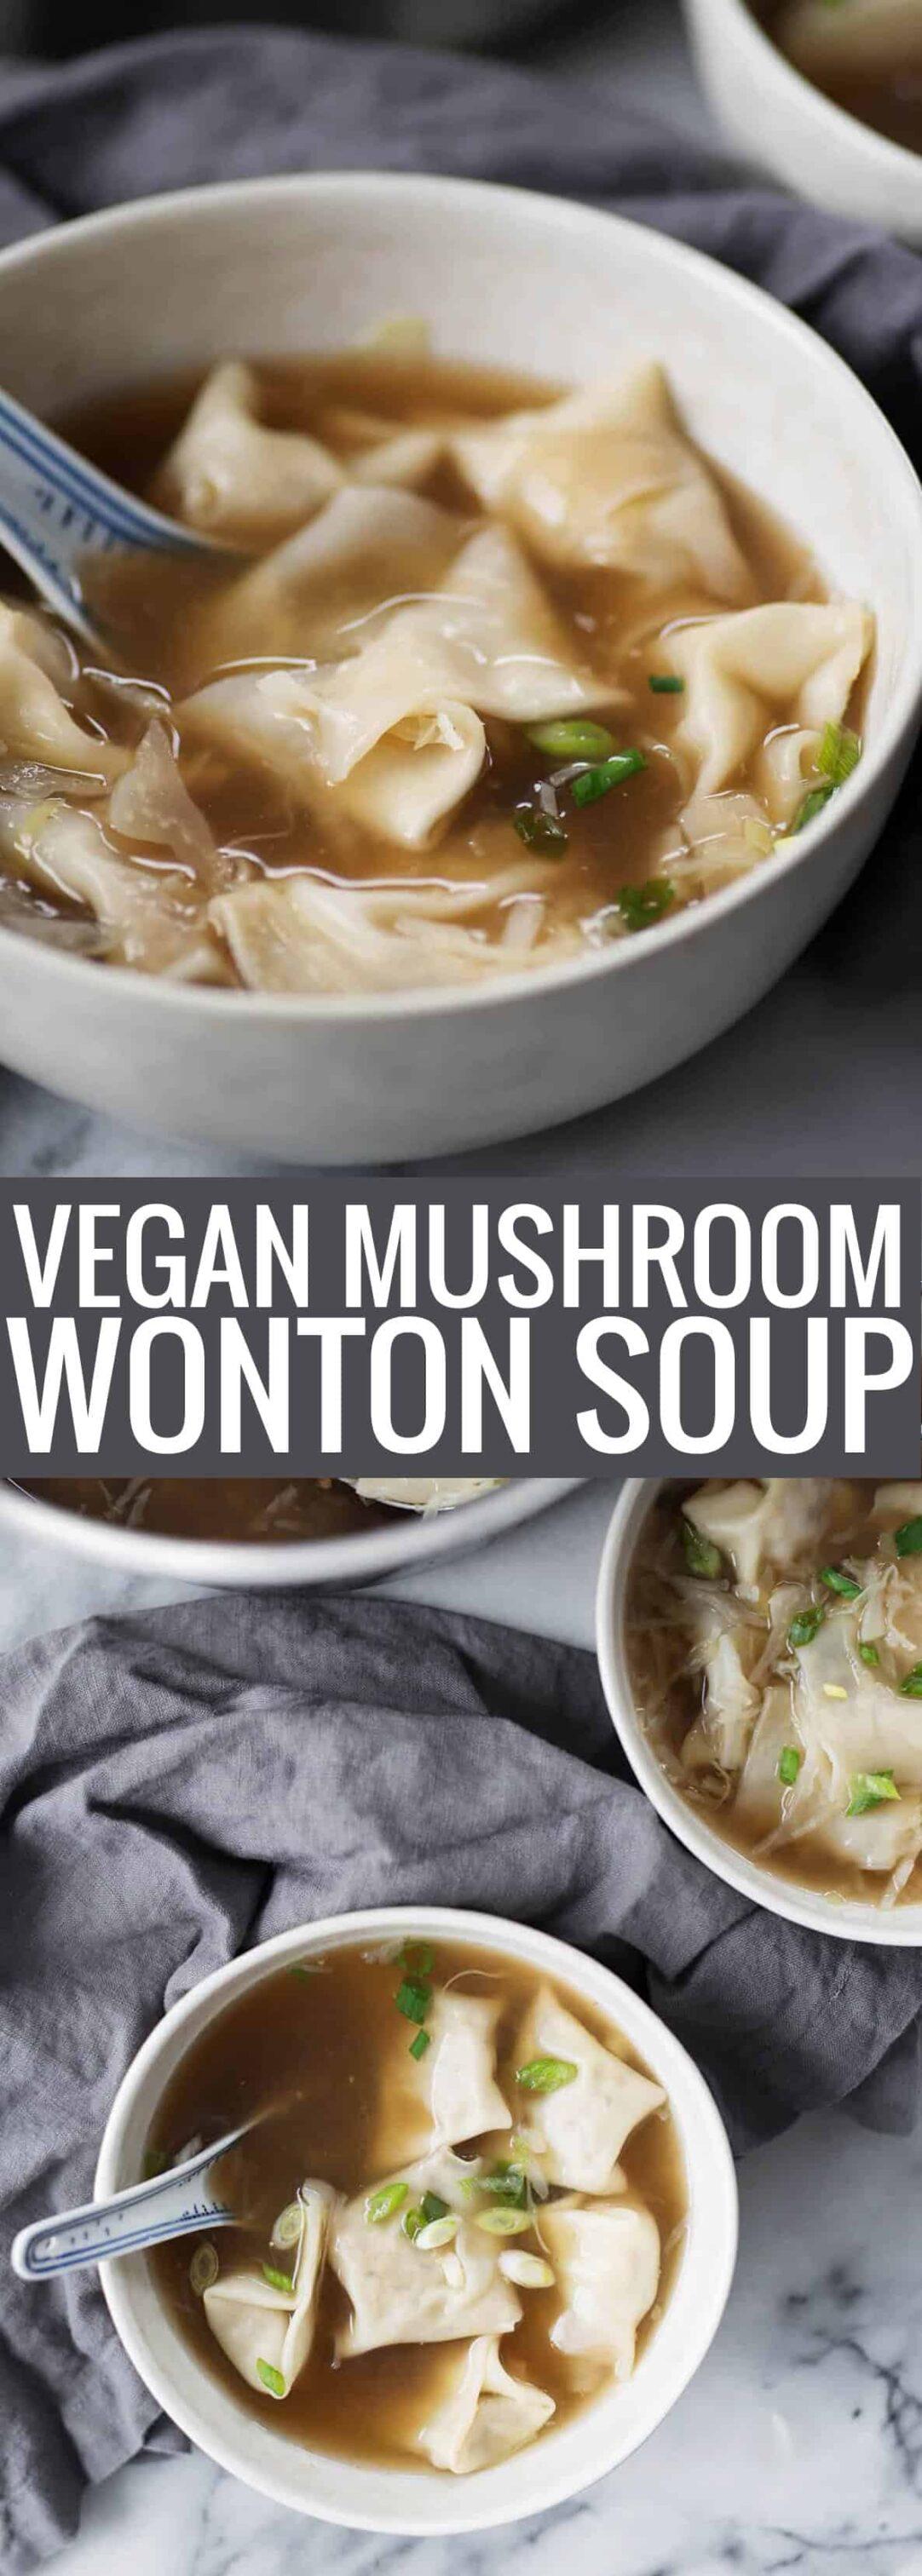 bowl of mushroom wonton soup